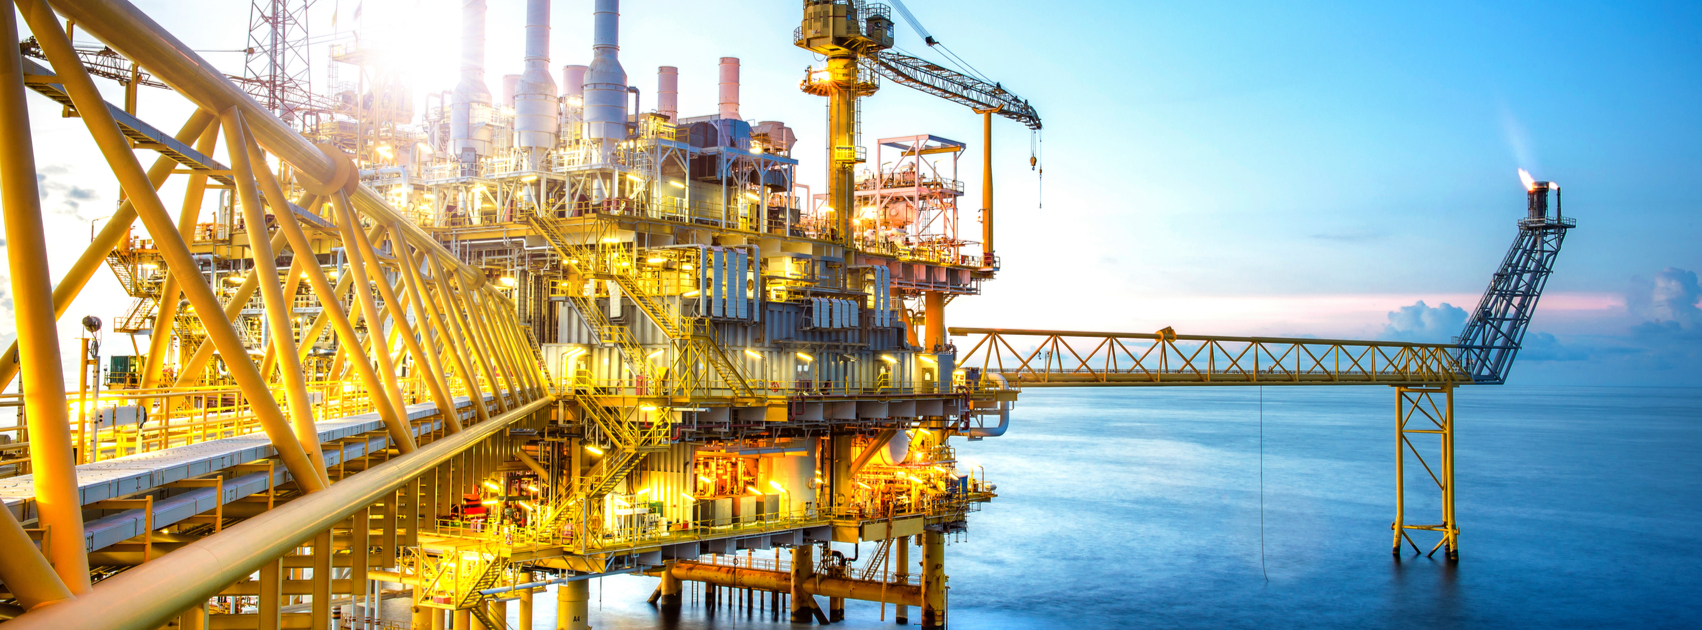 corrosive & toxic gas regulators